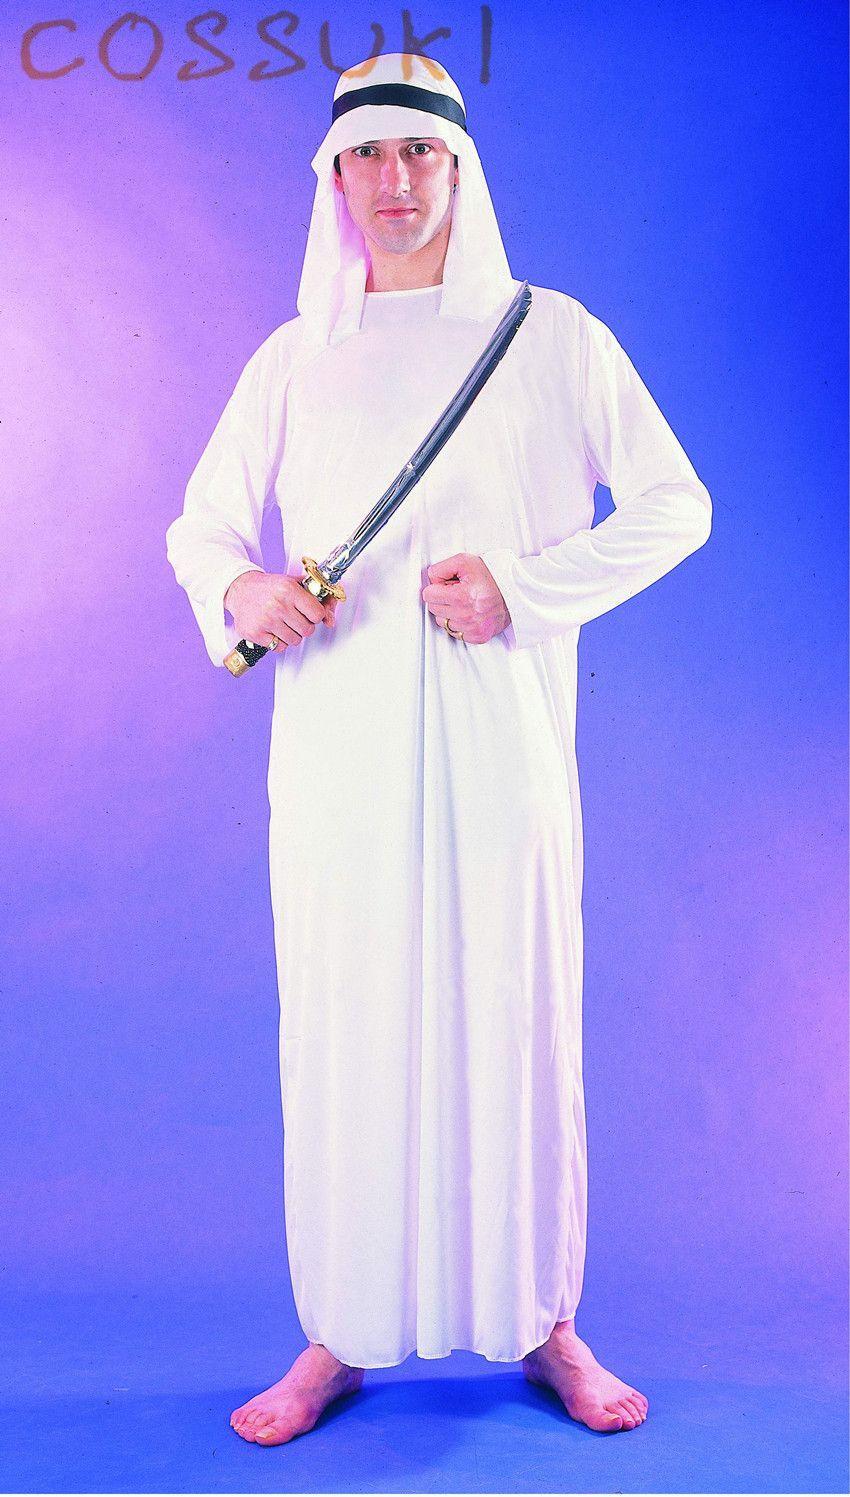 halloween exotic adult men white arab robe arabian prince cosplay